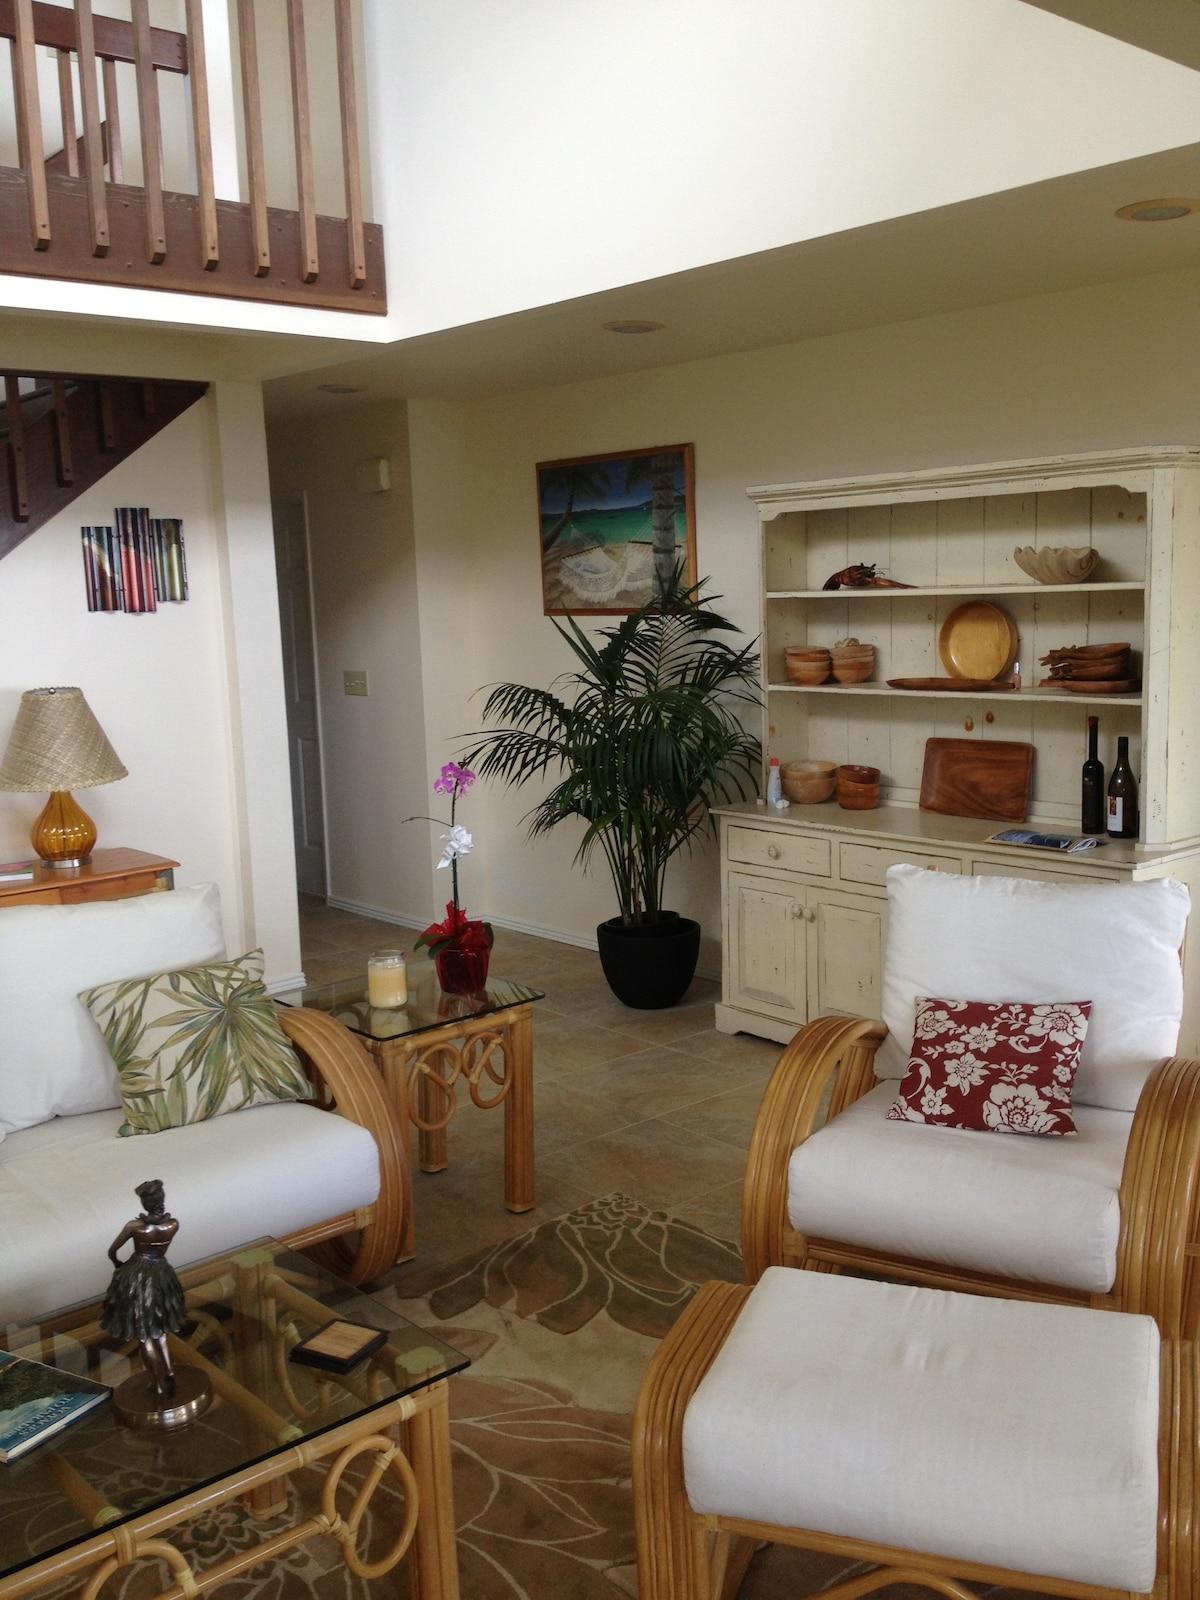 Wiamea Room - Private Room